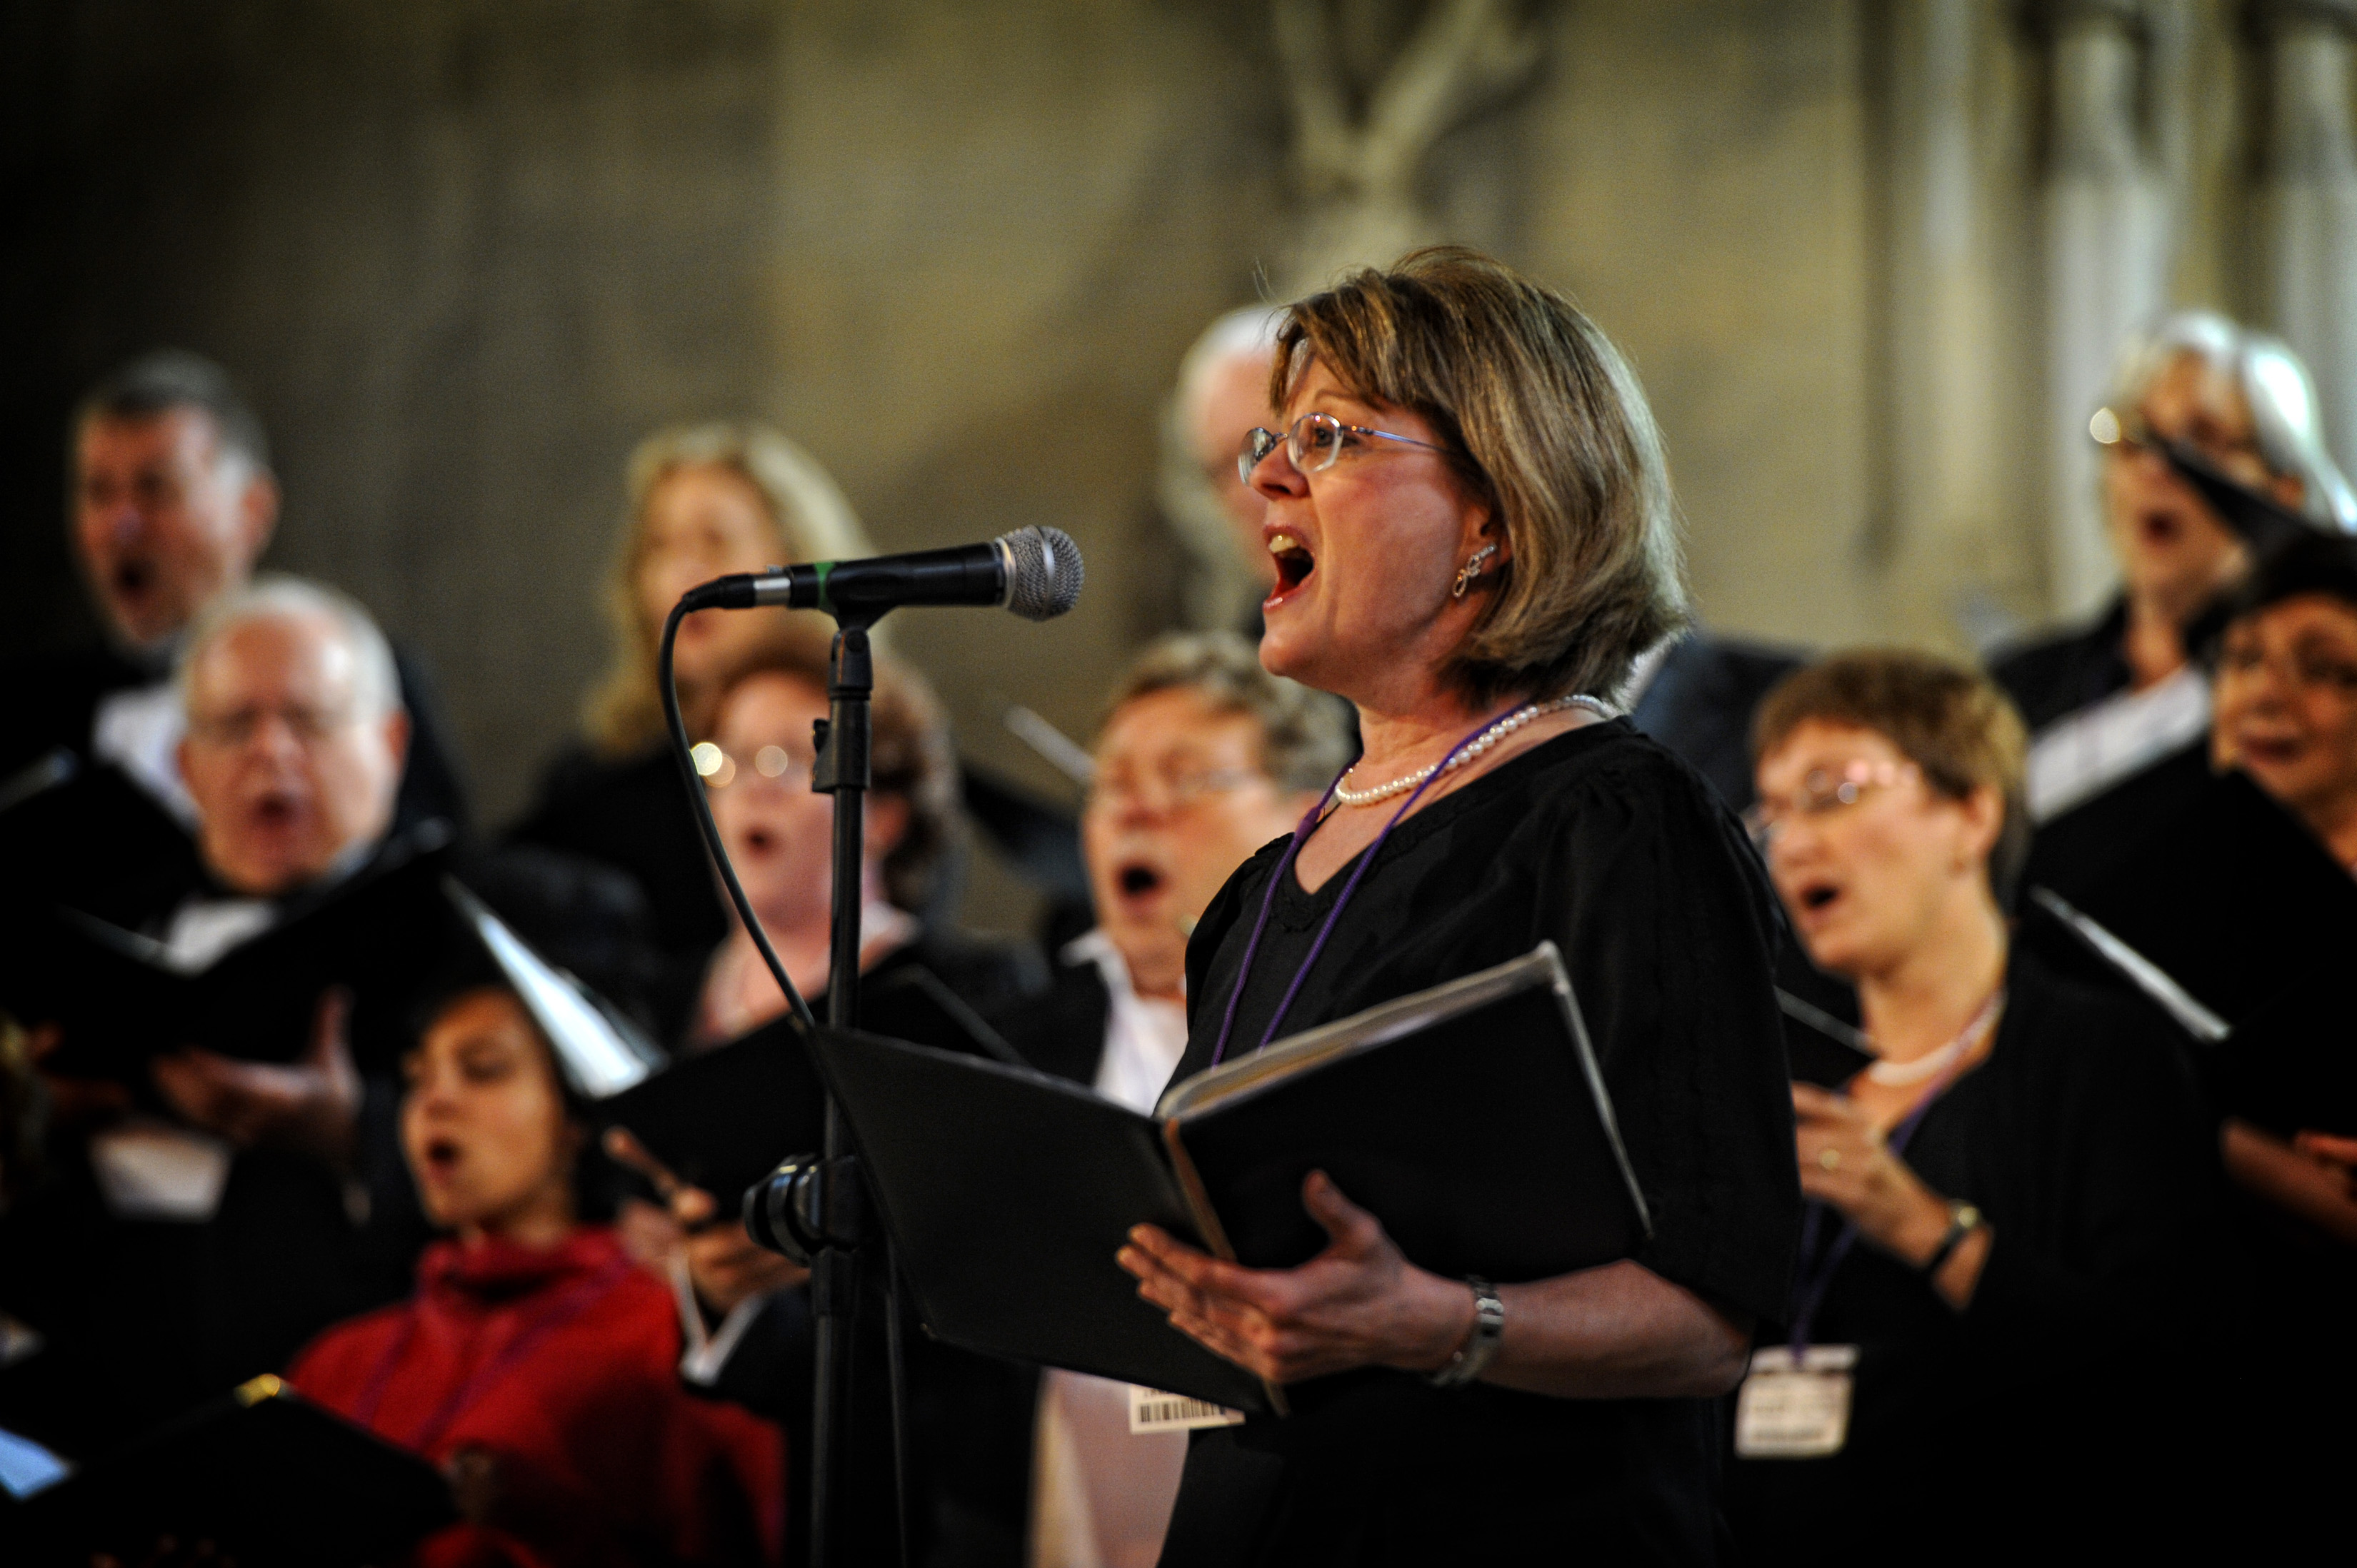 Guelph Chamber Choir of Canada